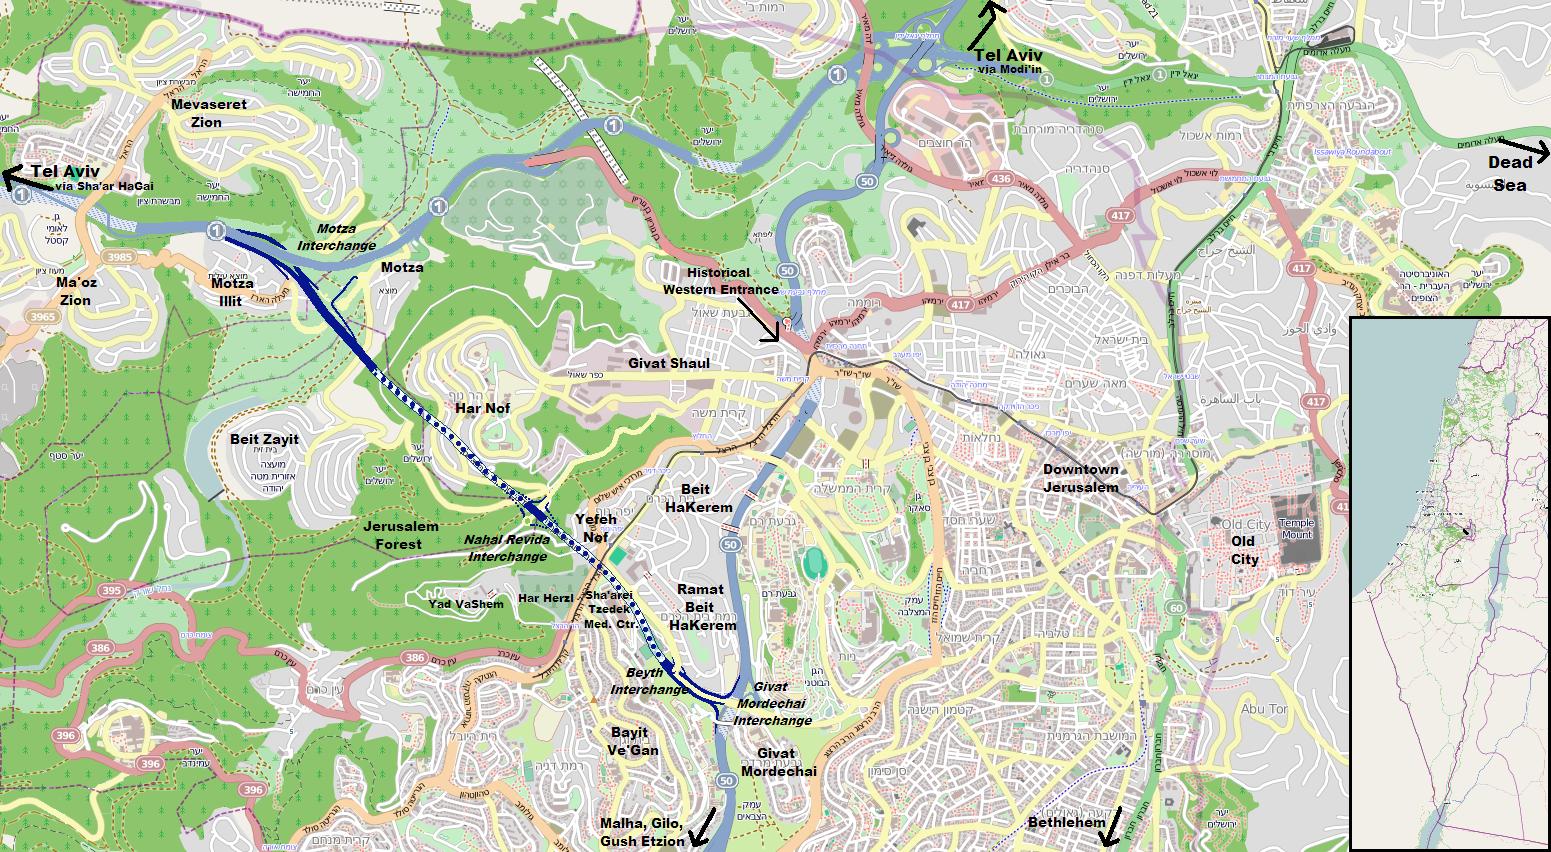 File:Jerusalem Road 16.png - Wikimedia Commons